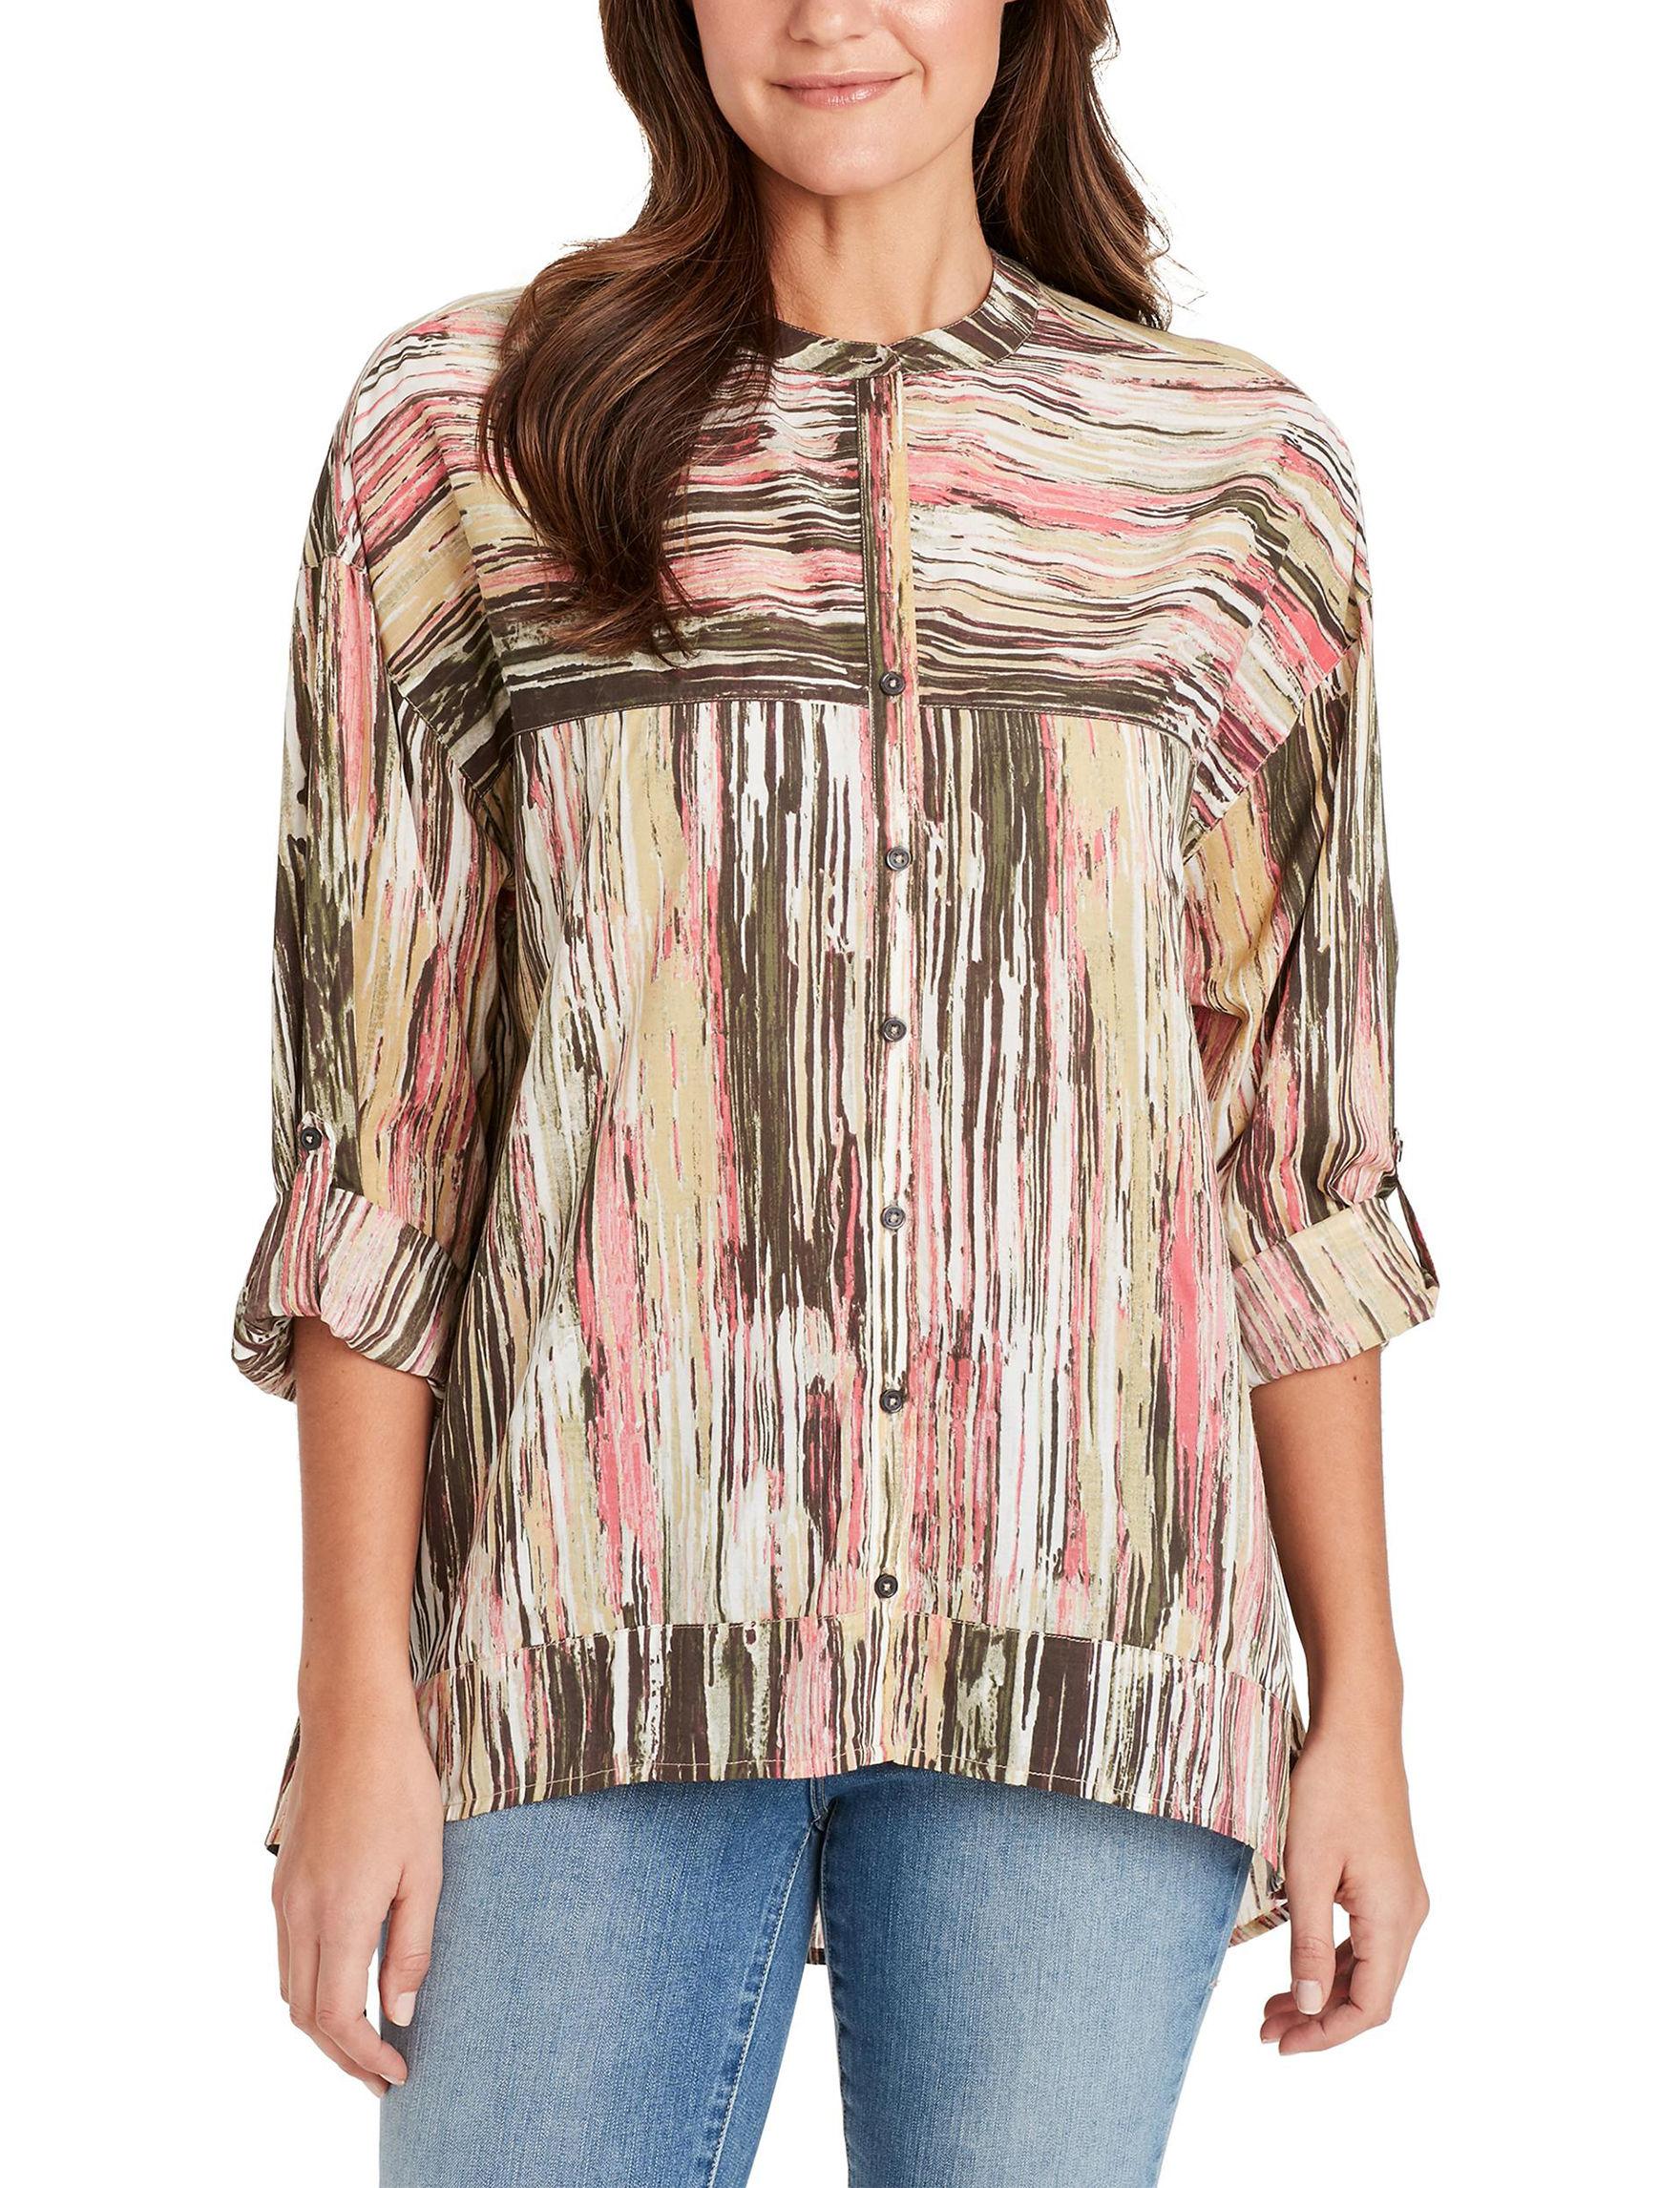 Nine West Brown / Multi Shirts & Blouses